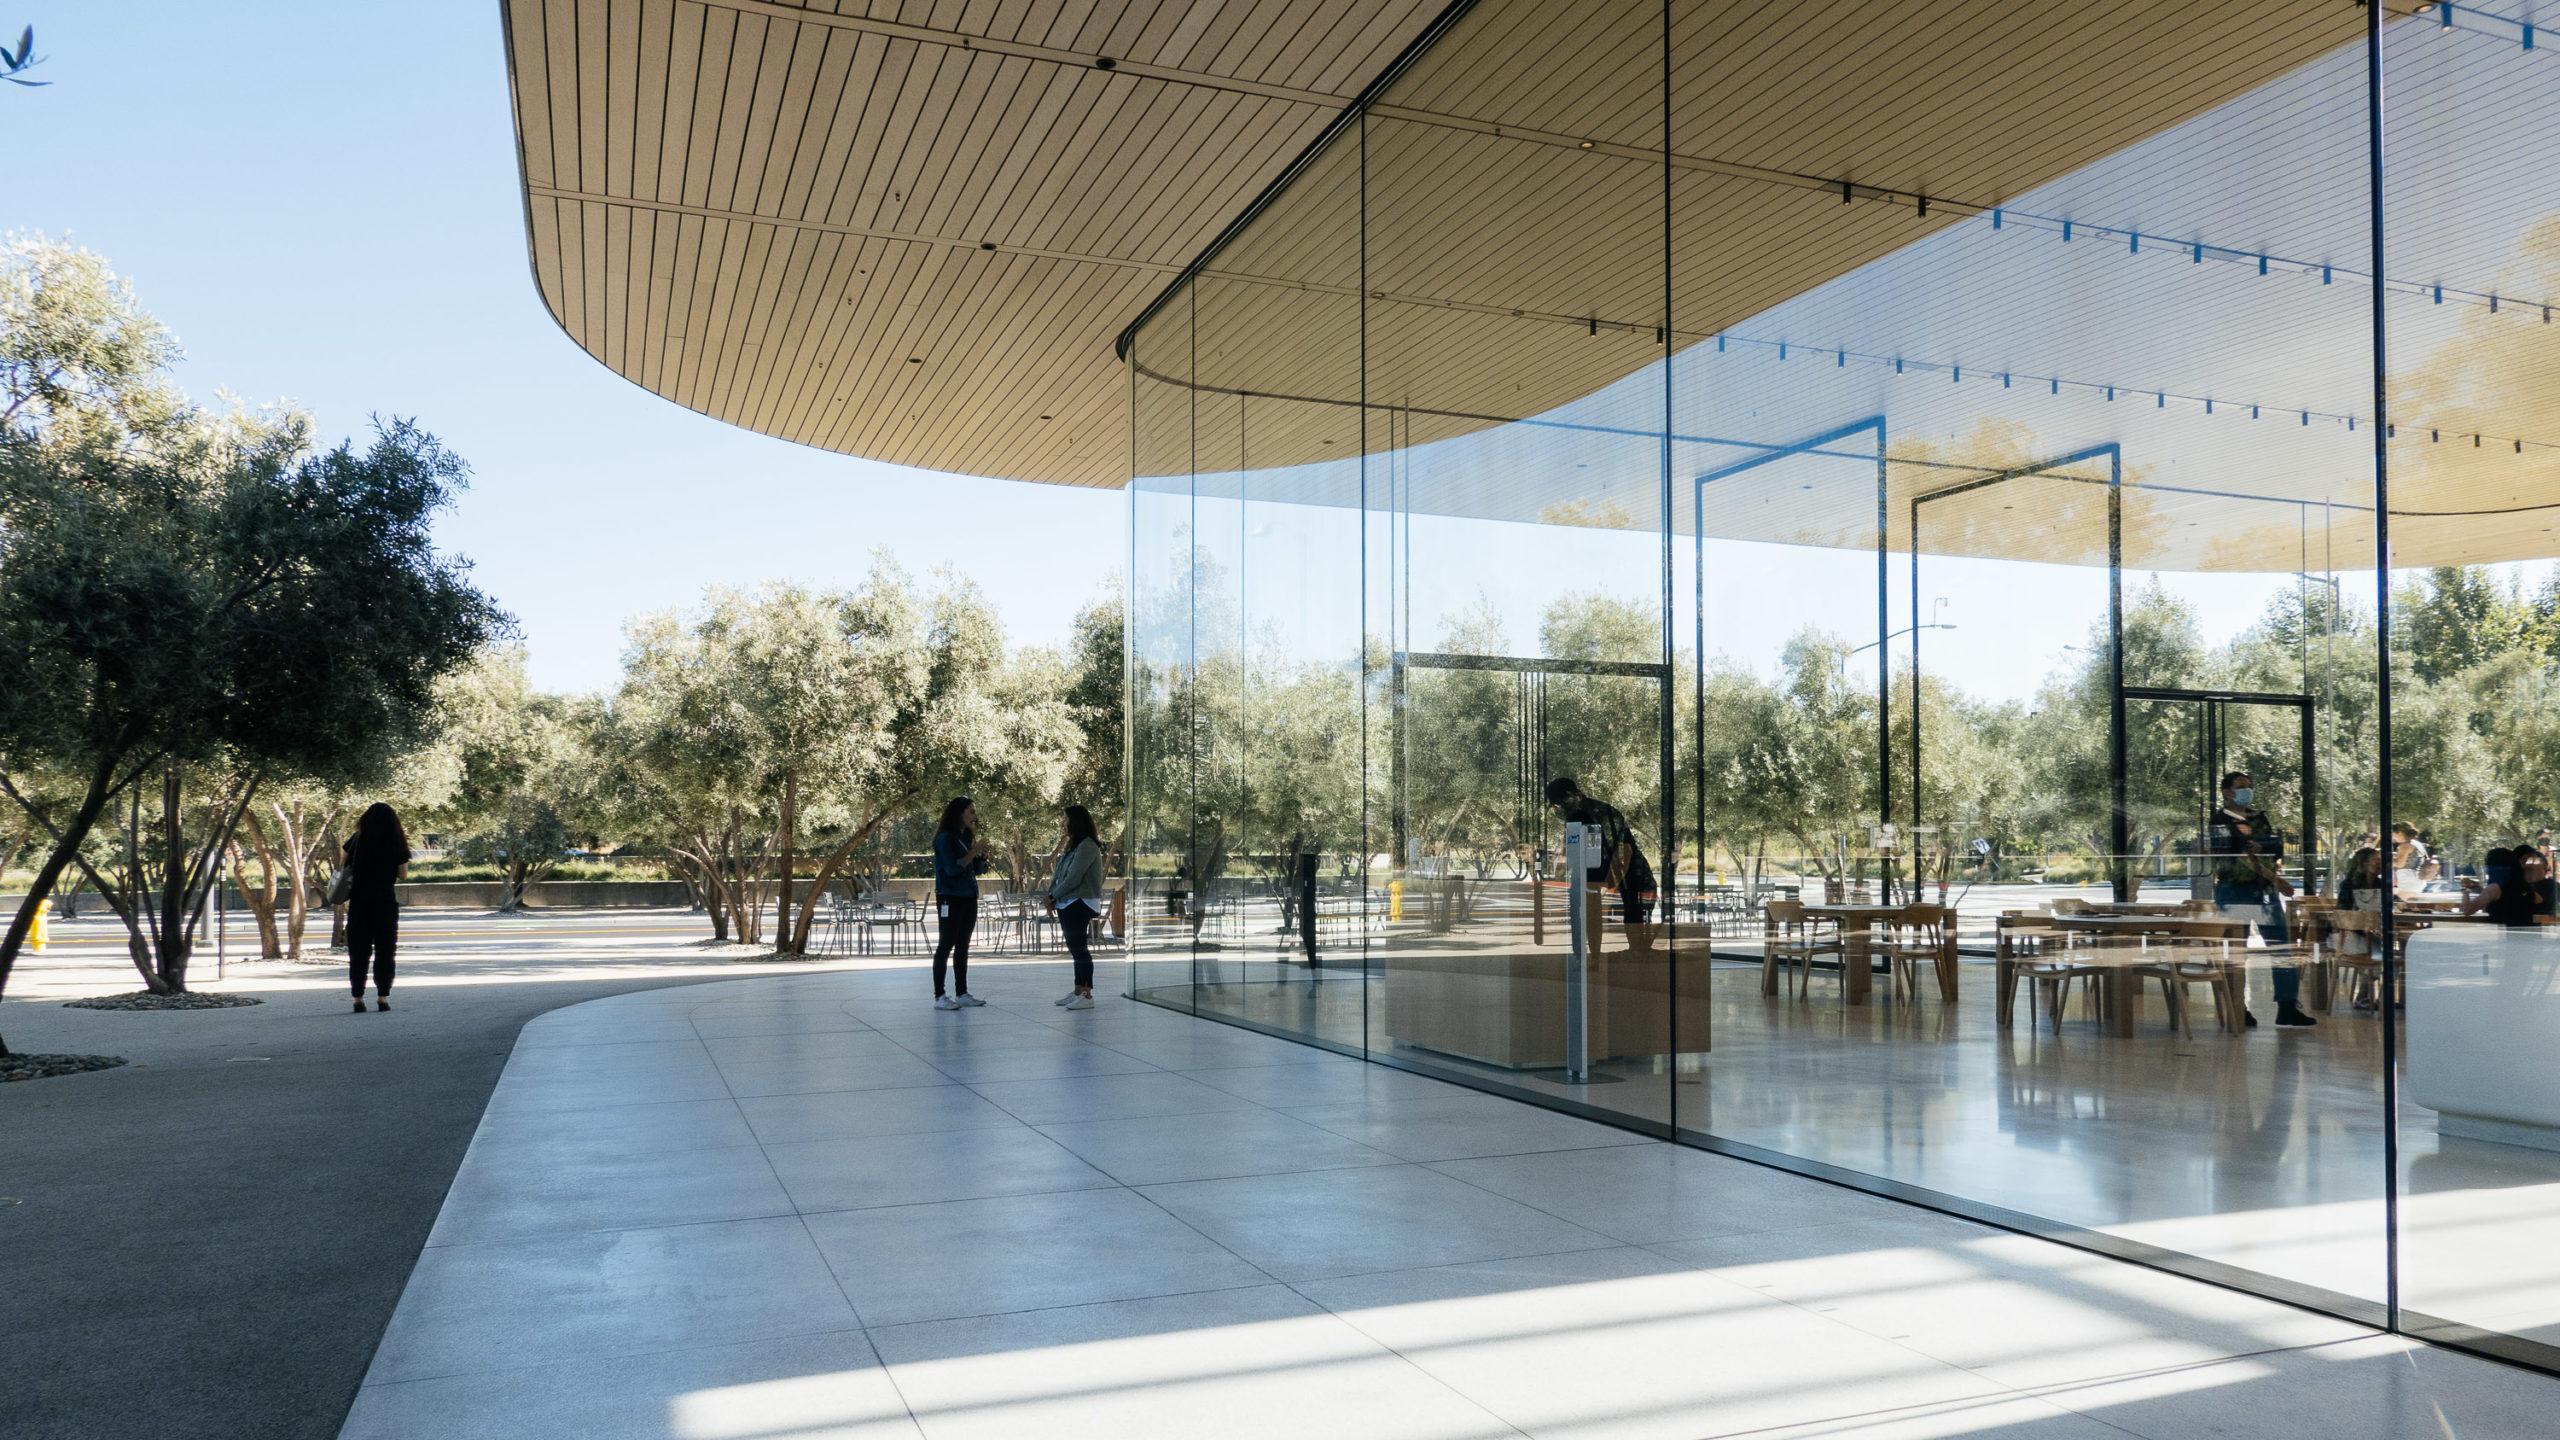 Exterior of a modern designed glass and concrete building